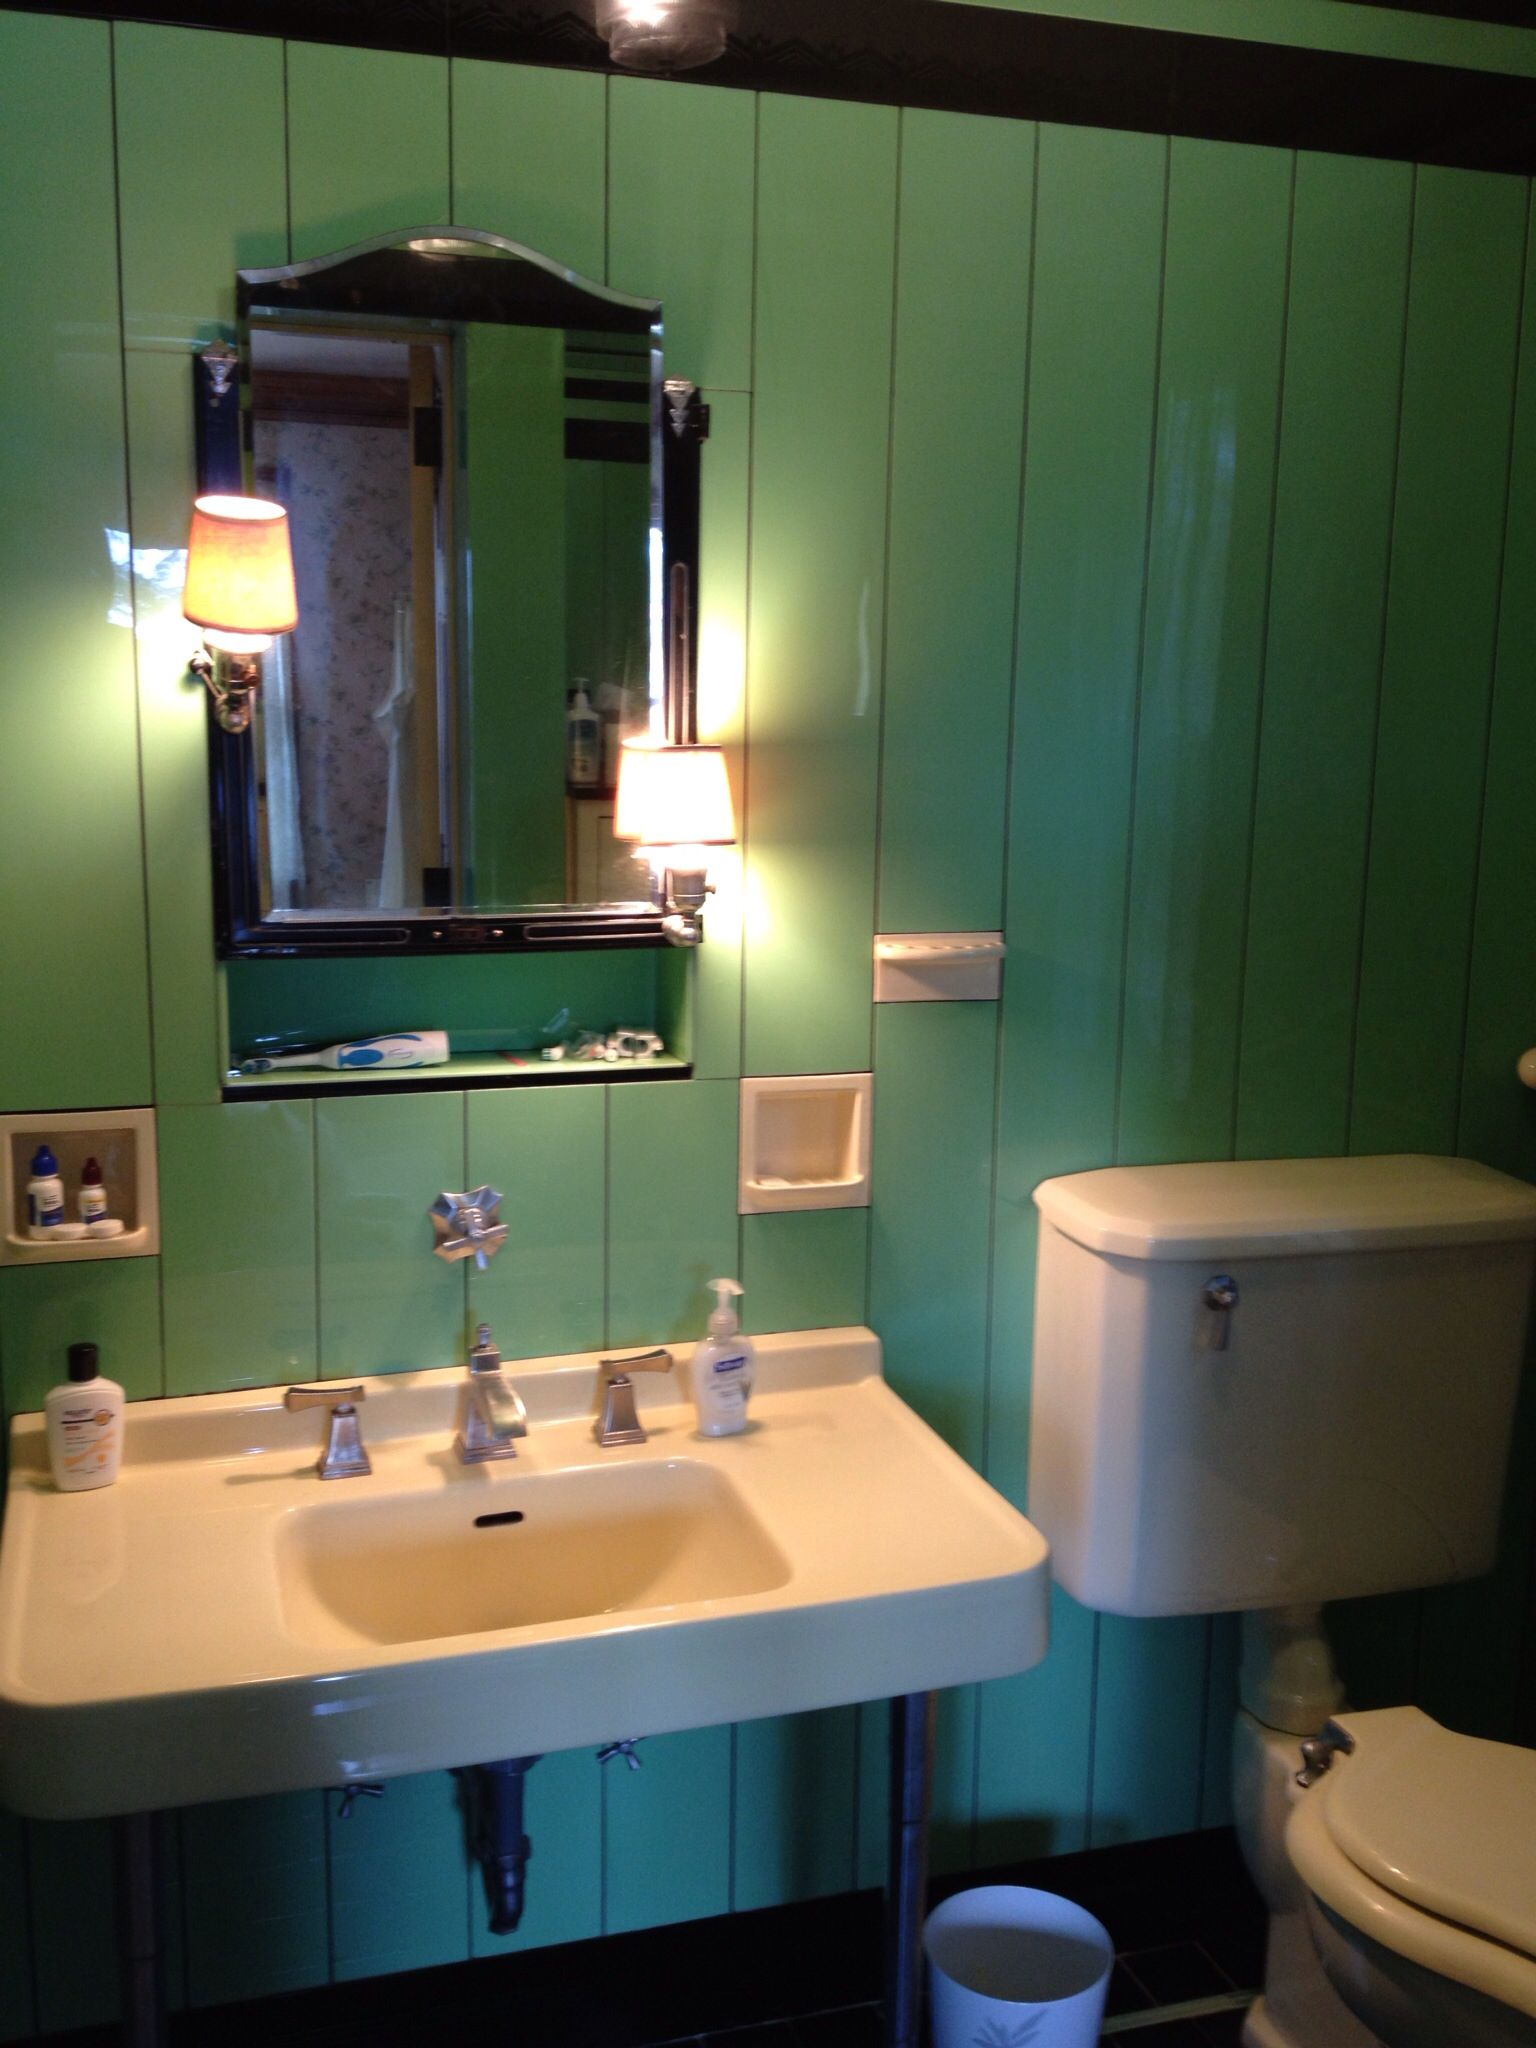 Jade vitrolite art deco 1930 39 s bathroom with original kohler sink and toi - Toilette original deco ...